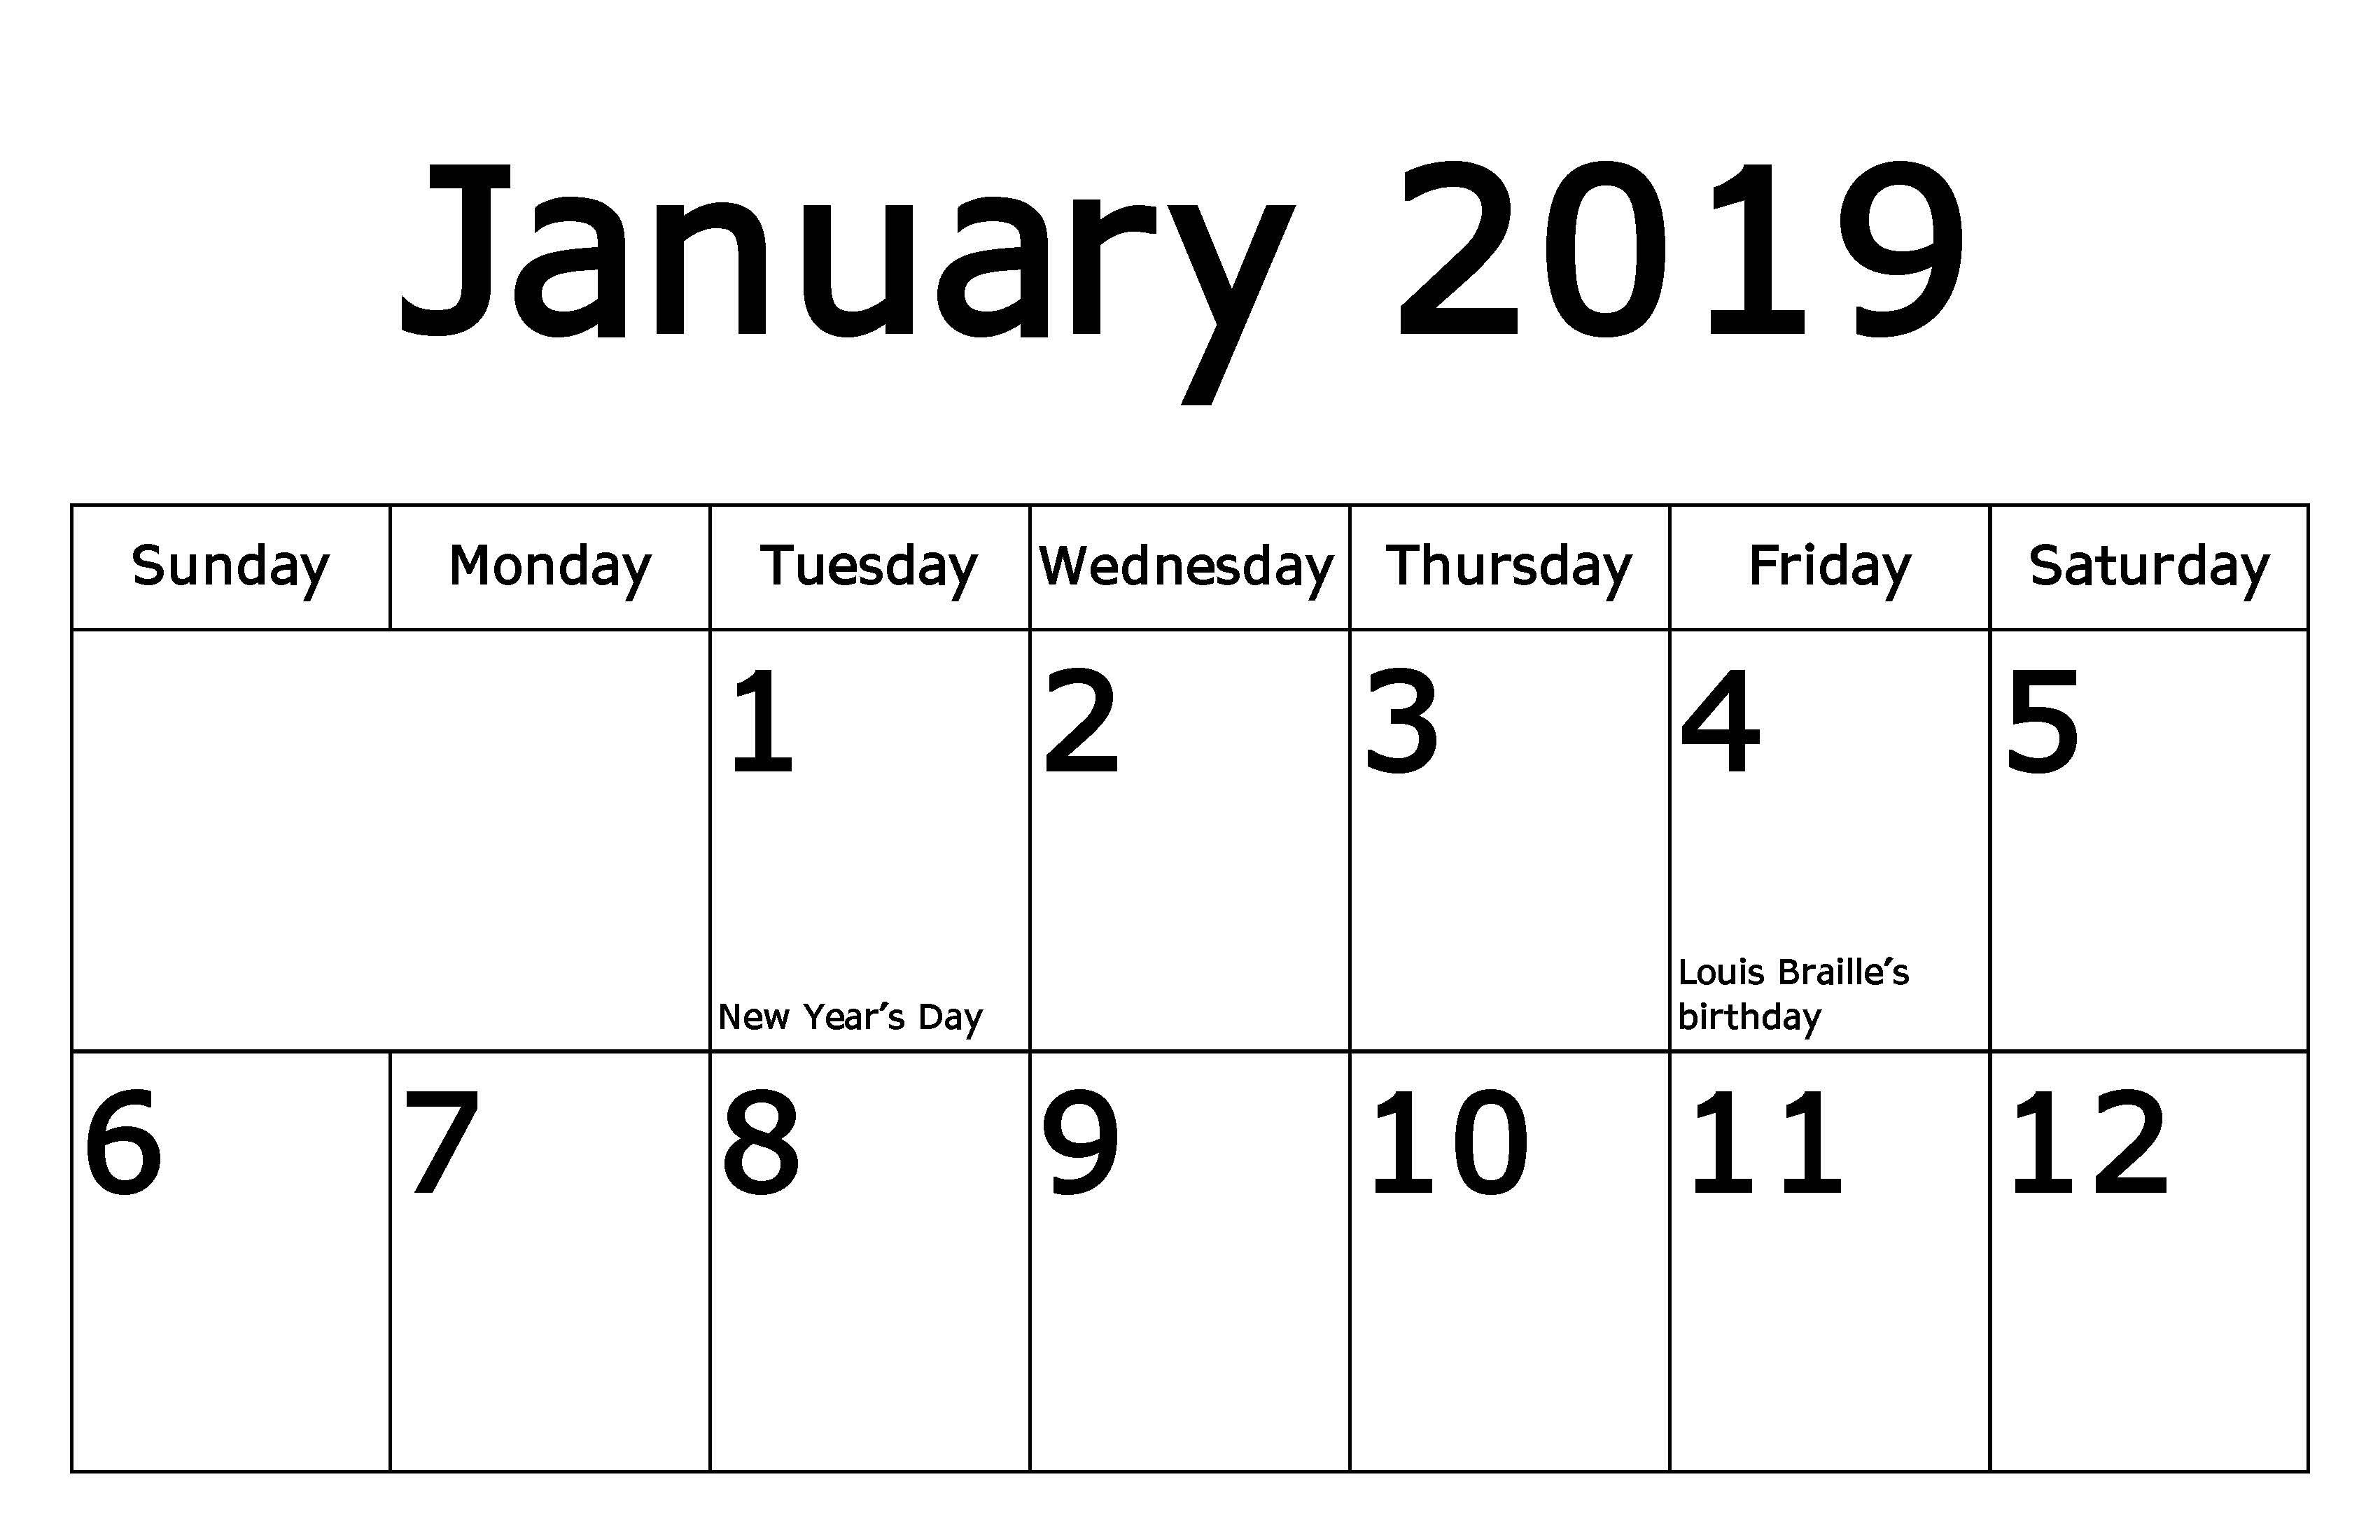 January 2019 calendar - top half